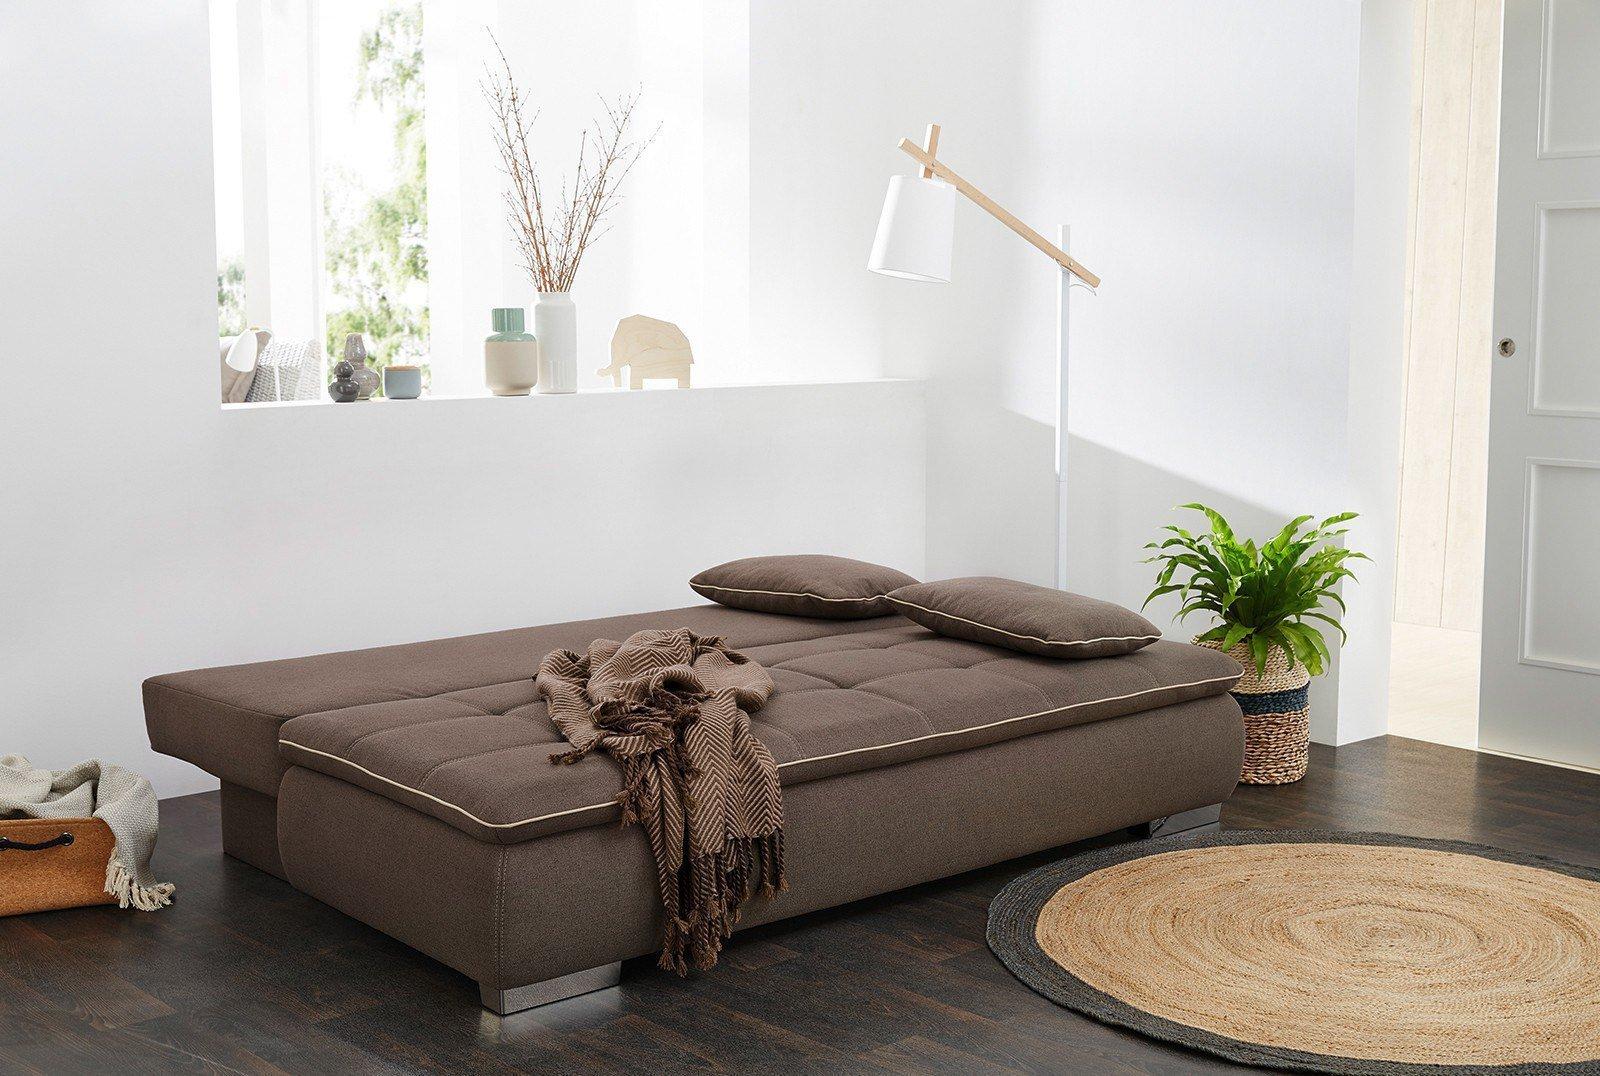 jockenh fer sofa cody cleo in braun m bel letz ihr online shop. Black Bedroom Furniture Sets. Home Design Ideas